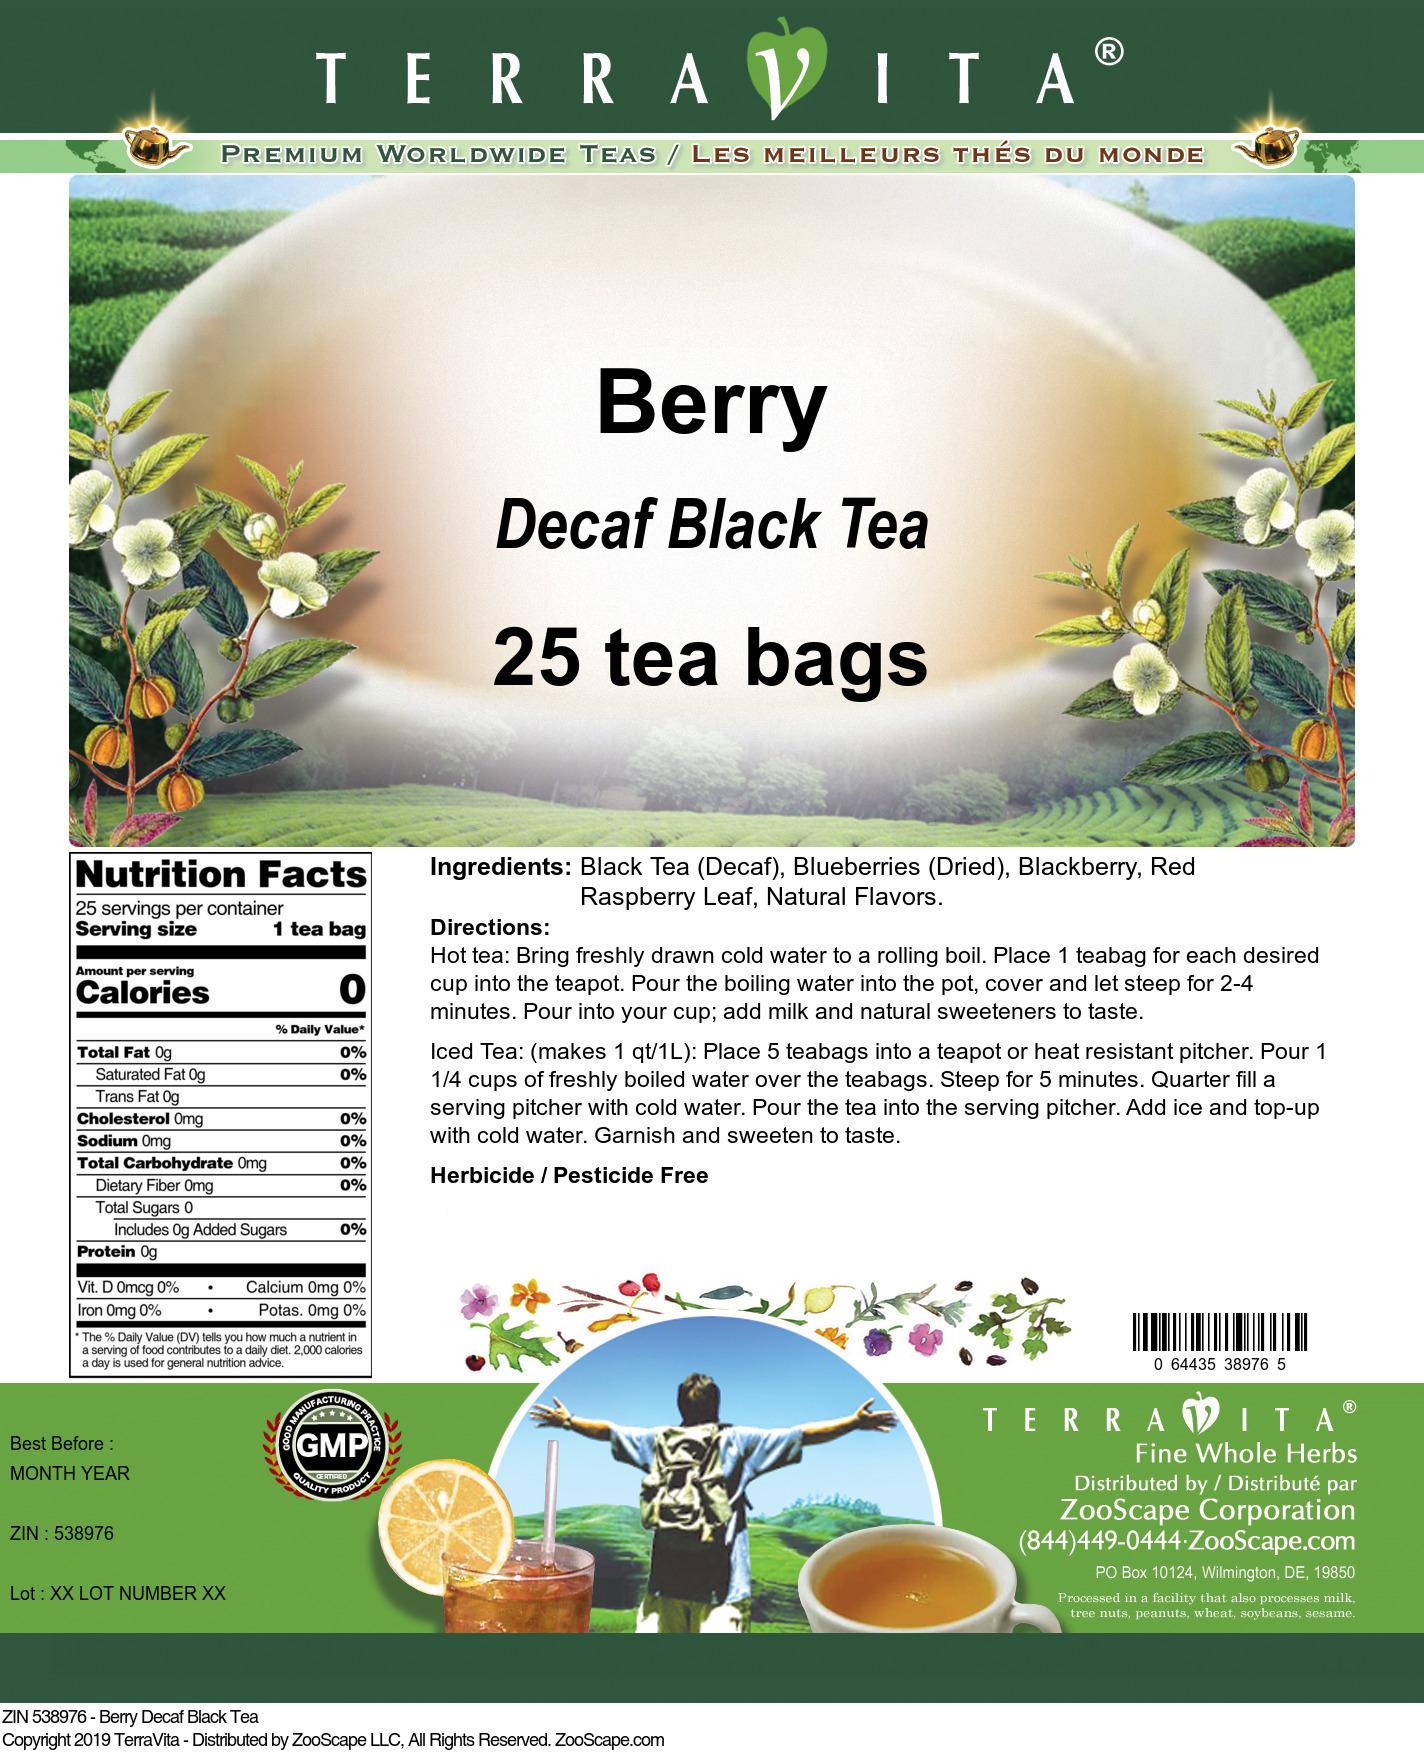 Berry Decaf Black Tea